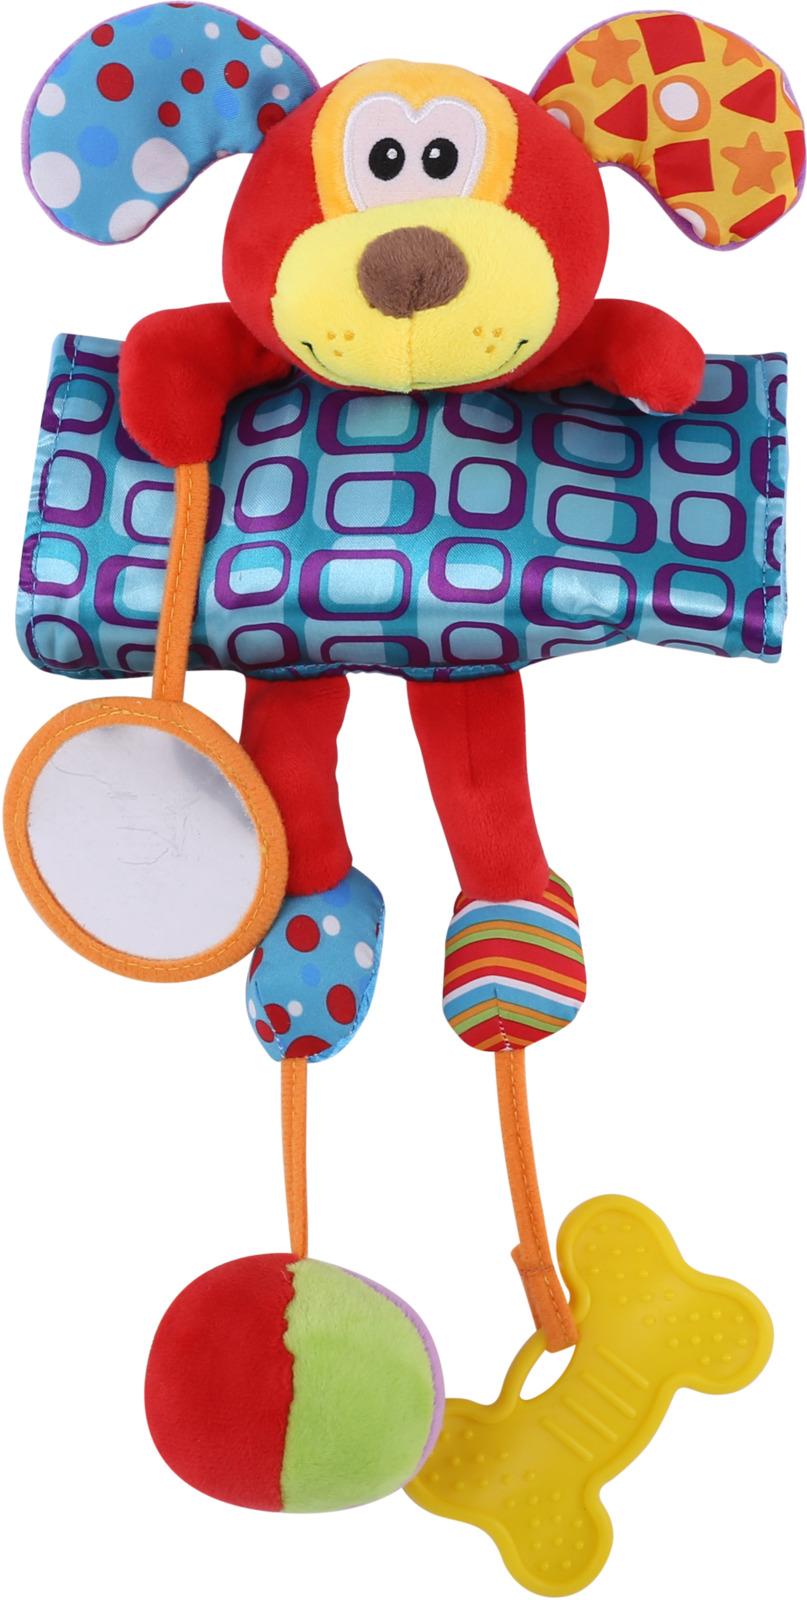 Развивающая игрушка Lorelli Toys Обними меня. Собачка. 10191260002 развивающая игрушка lorelli toys слоник 1019117